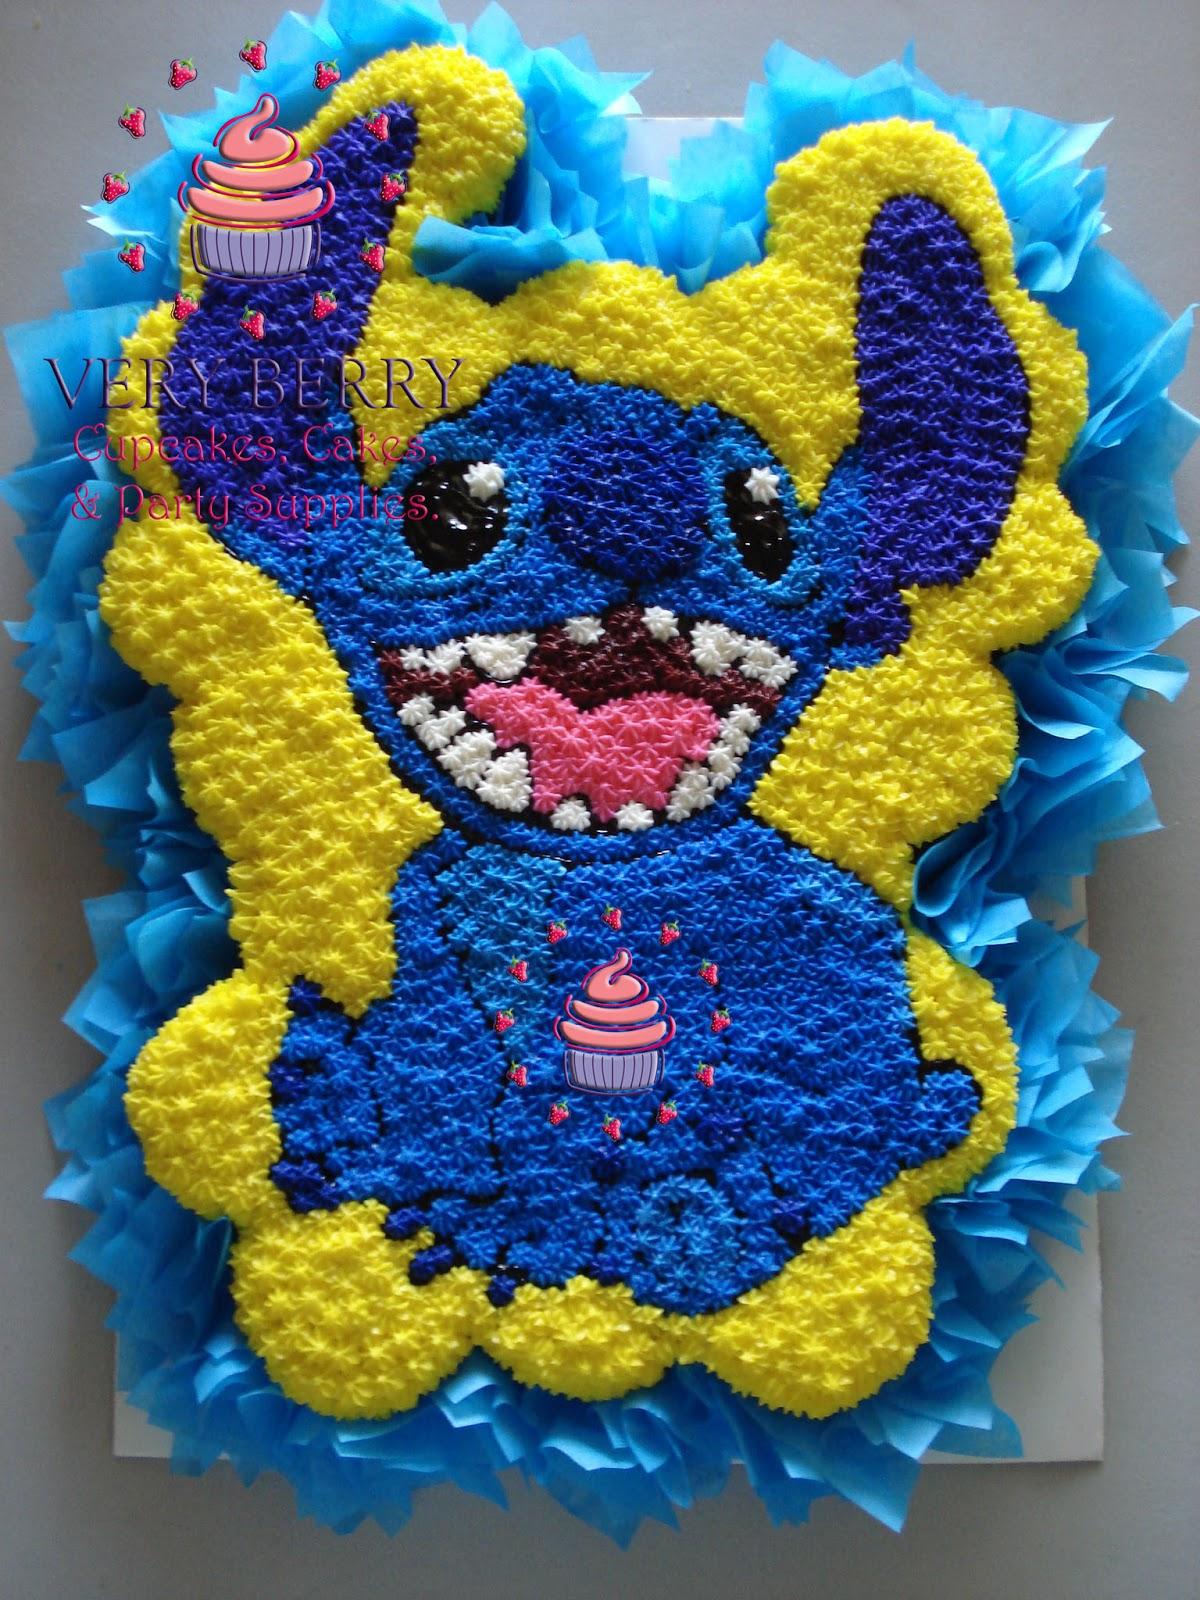 Veryberry Cupcakes Stitch Cupcake Cake